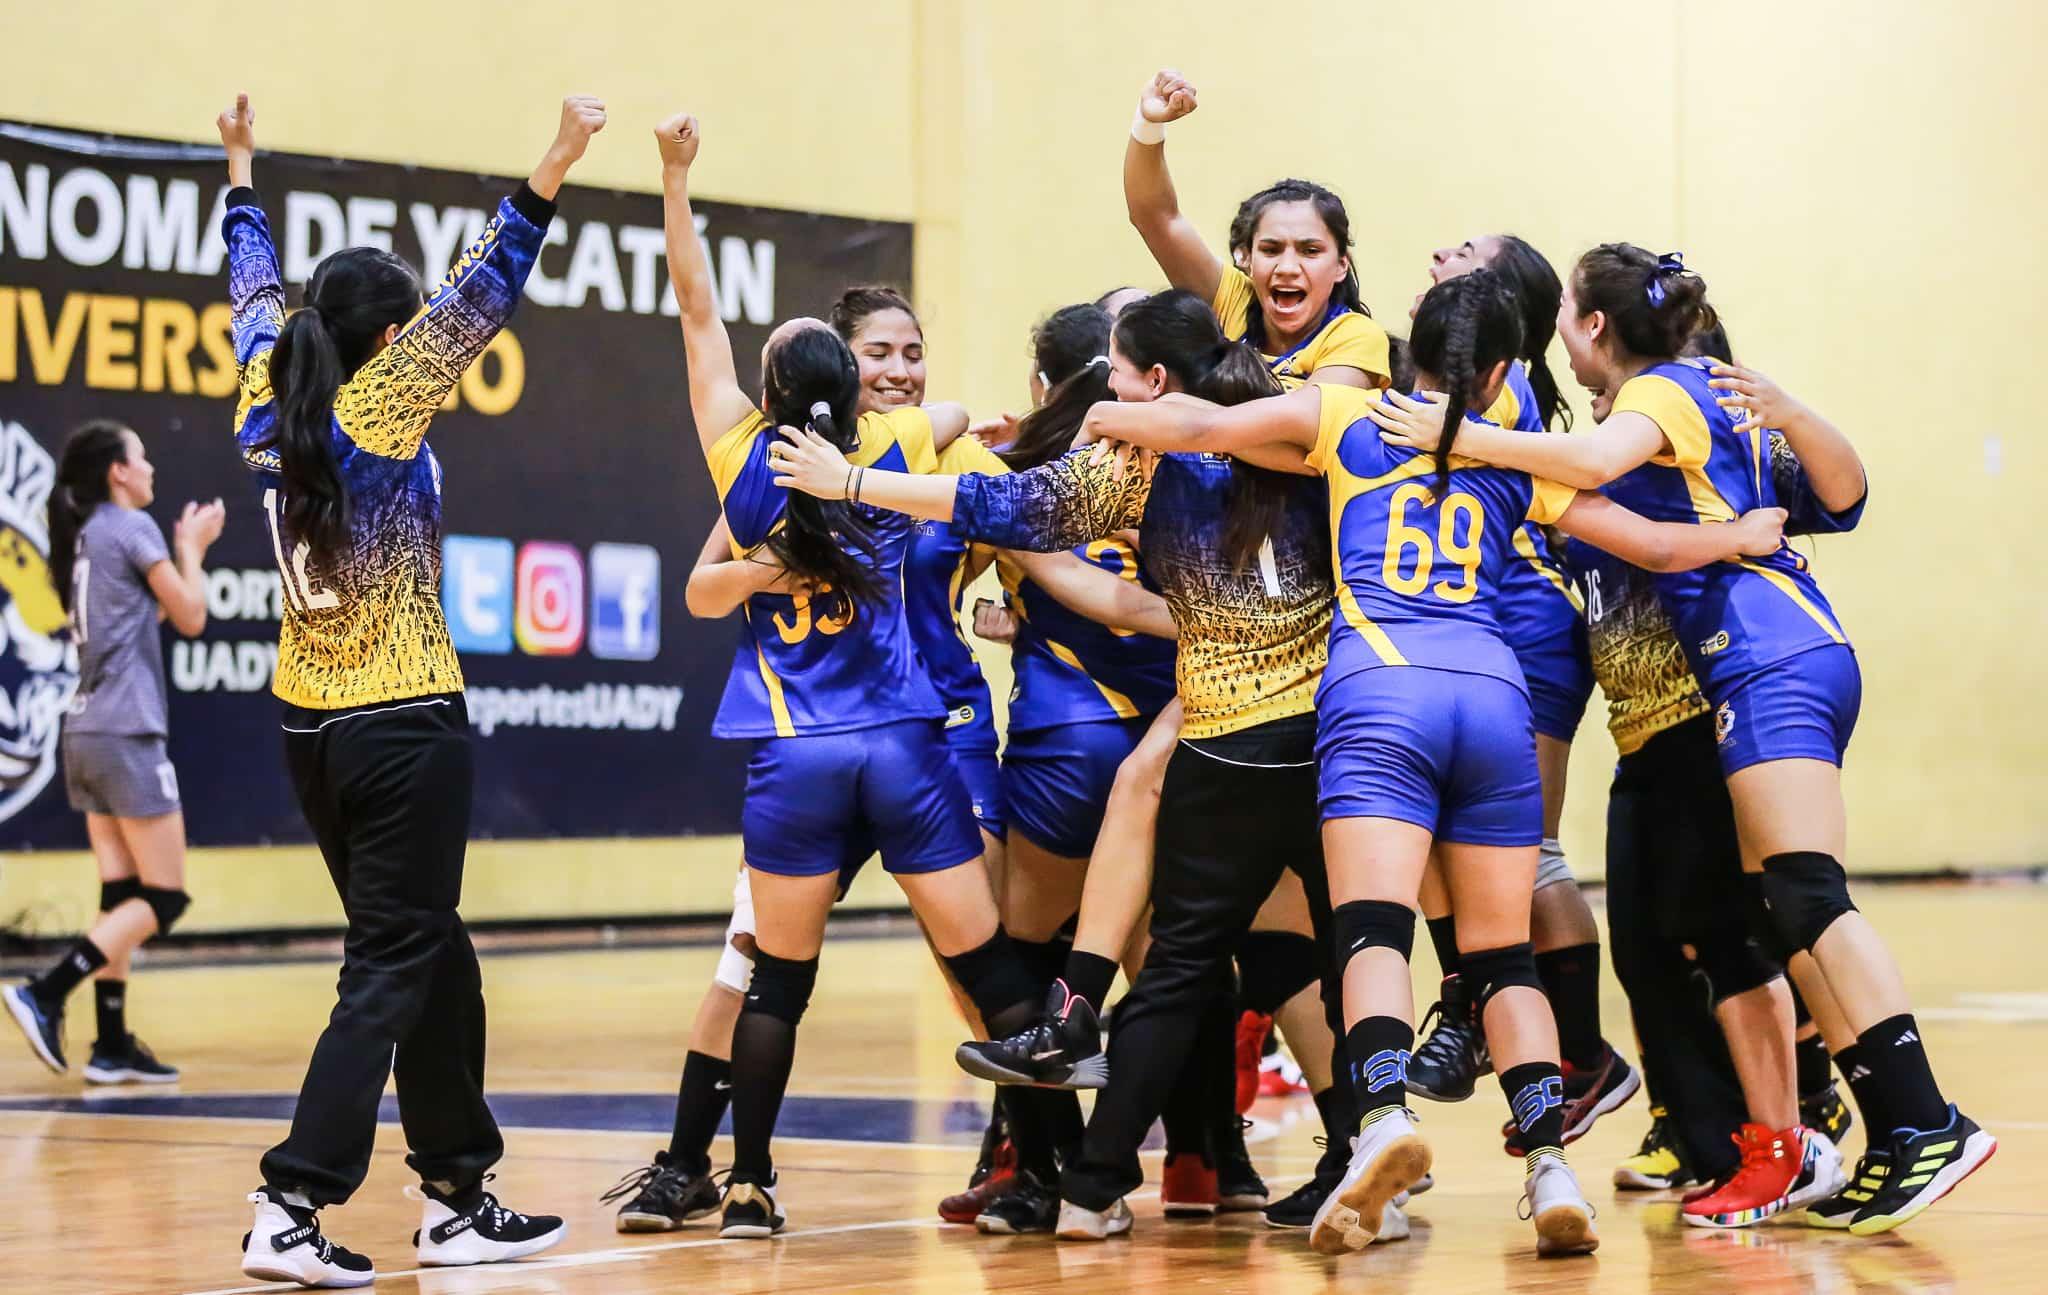 Festejo de Handball femenil campeonas 2019